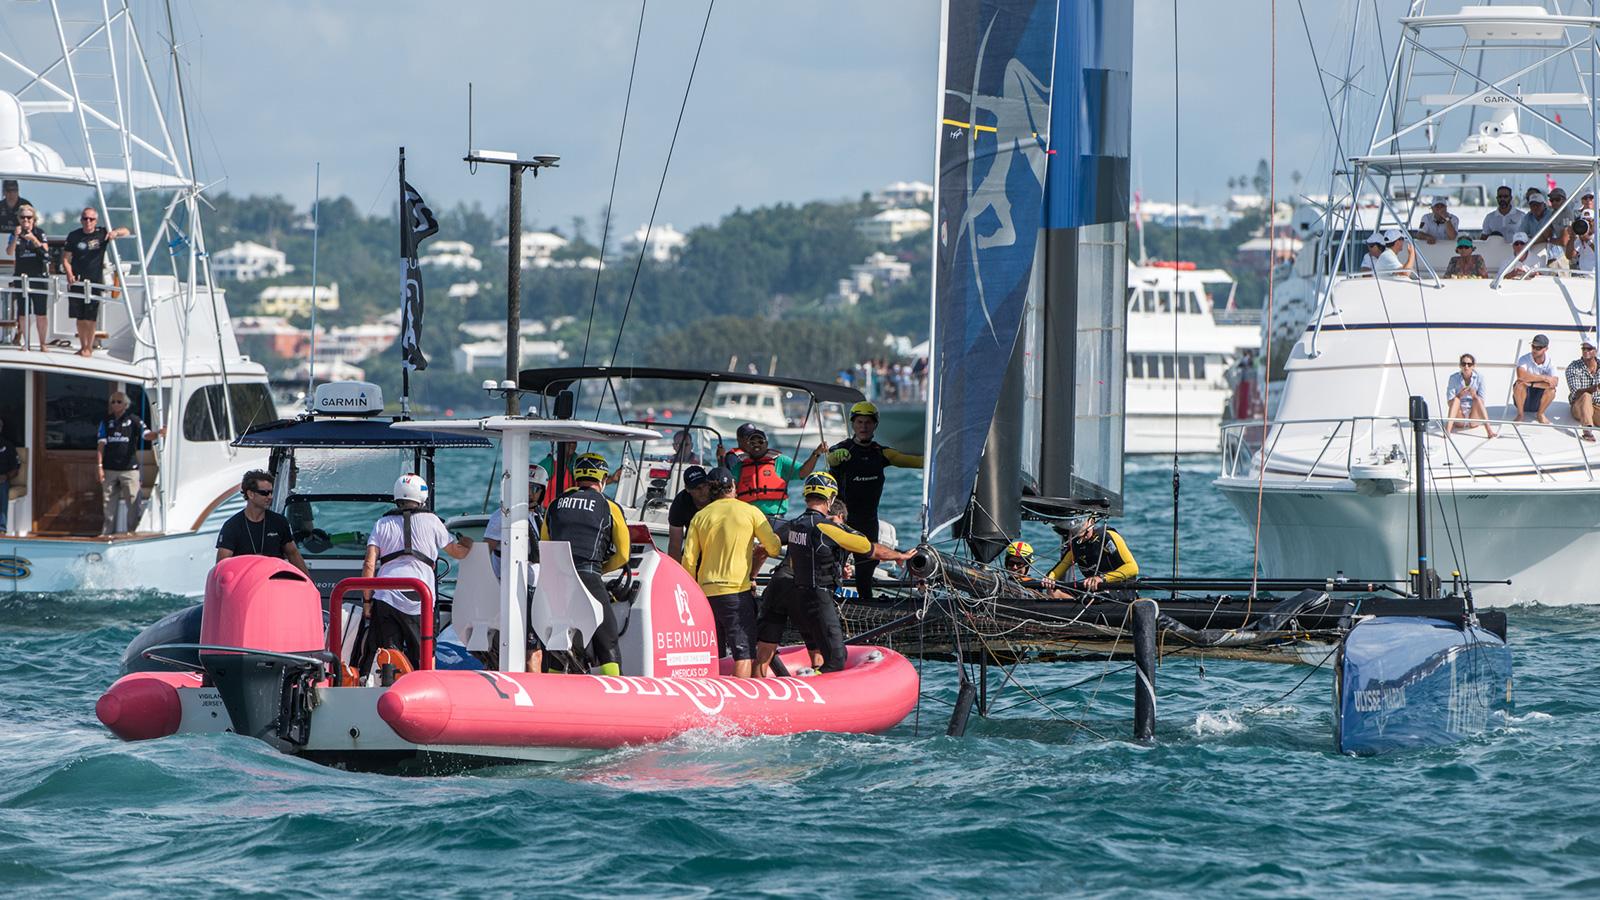 Americas Cup World Series Bermuda Crash2